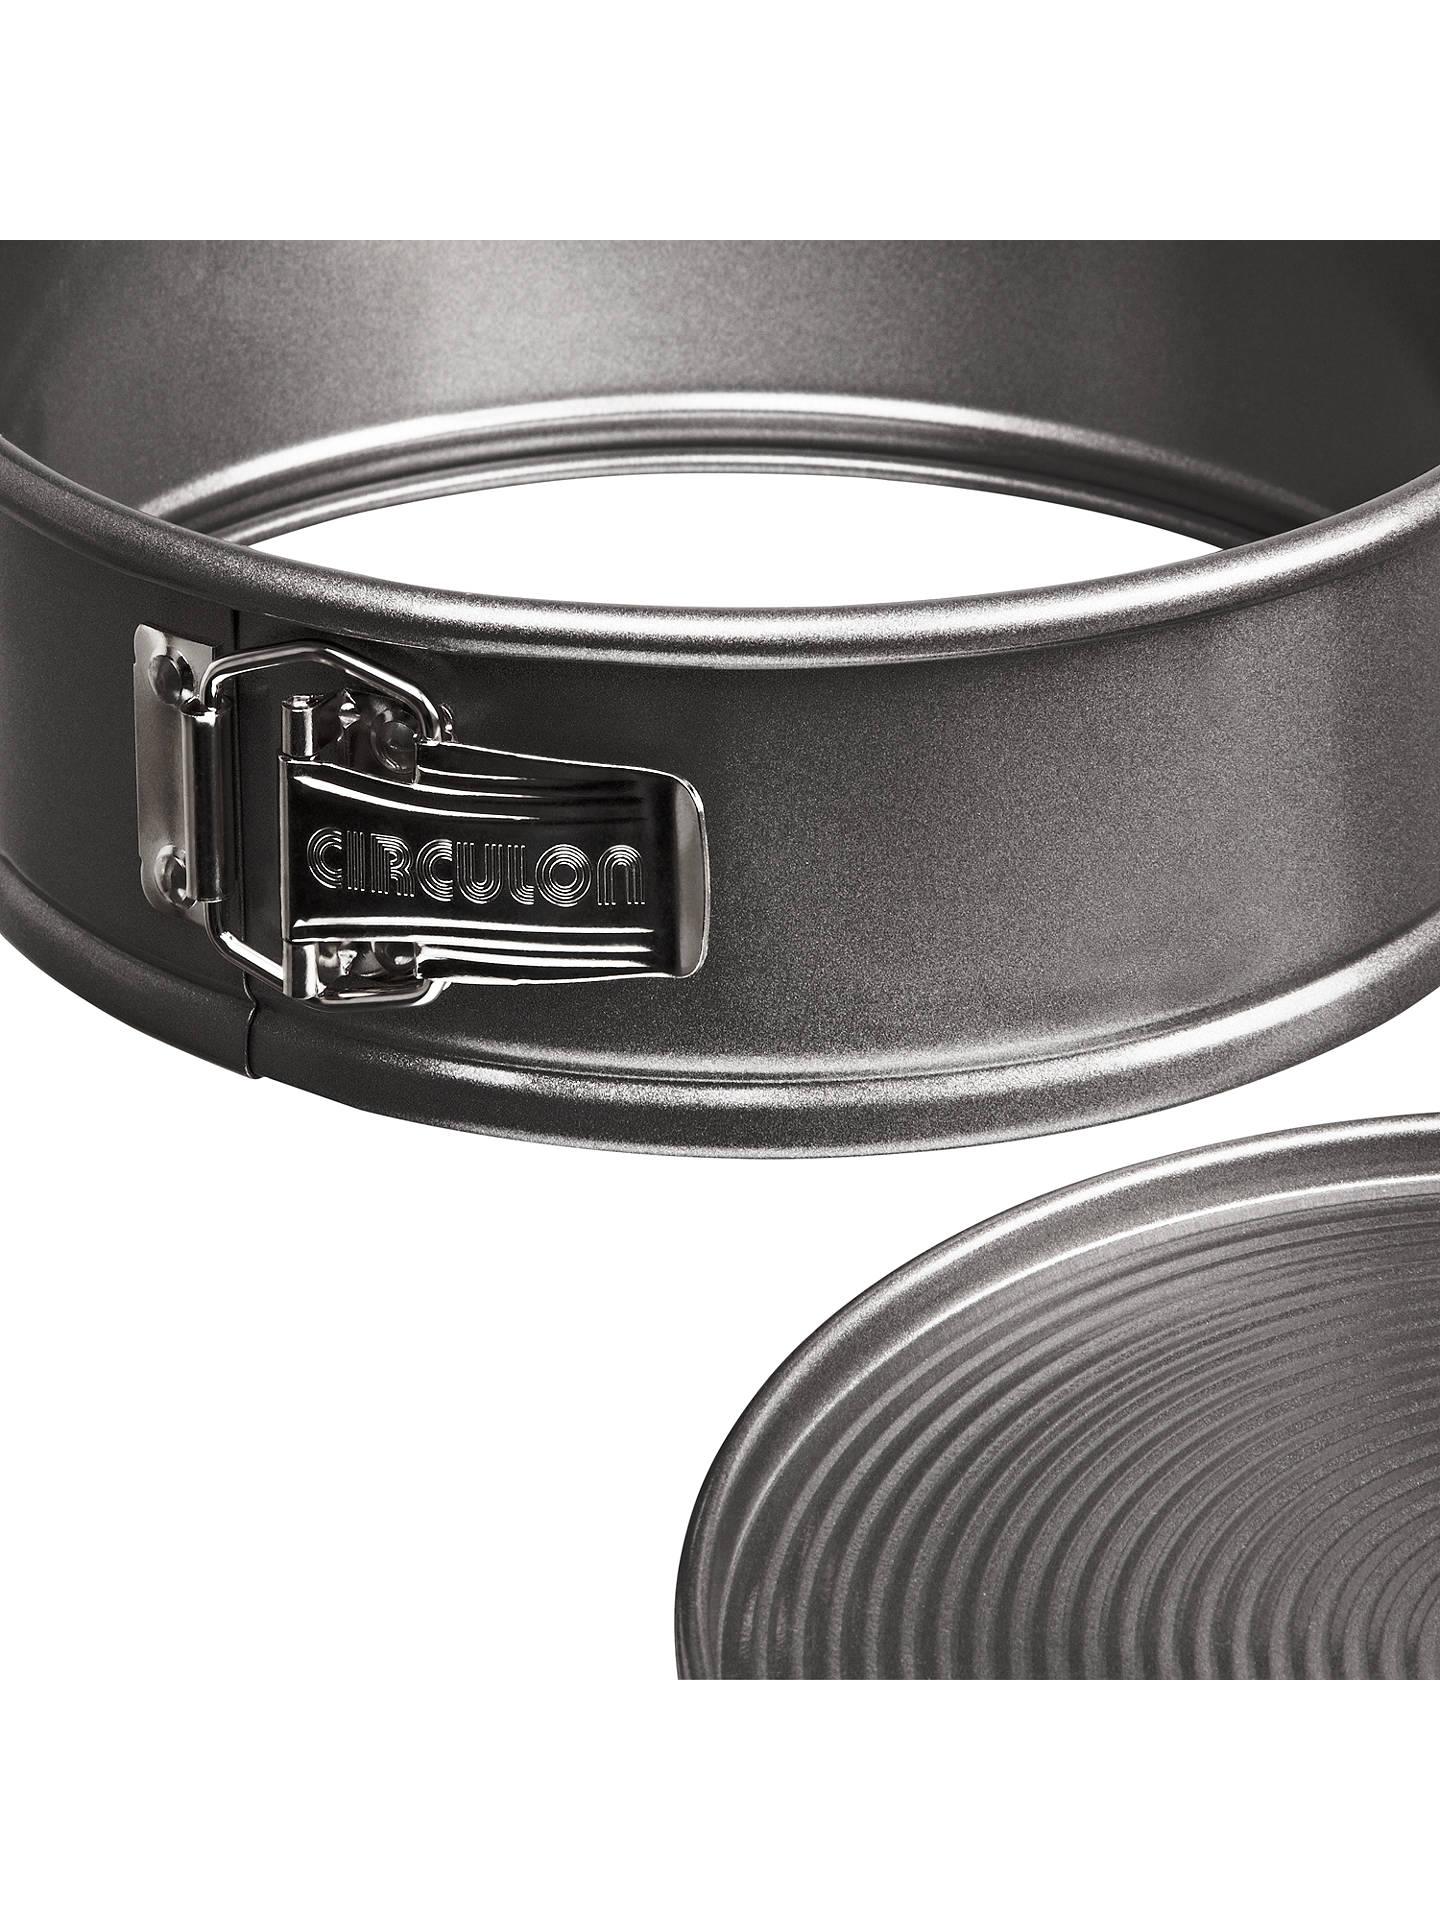 Circulon Carbon Steel Round Springform Cake Tin